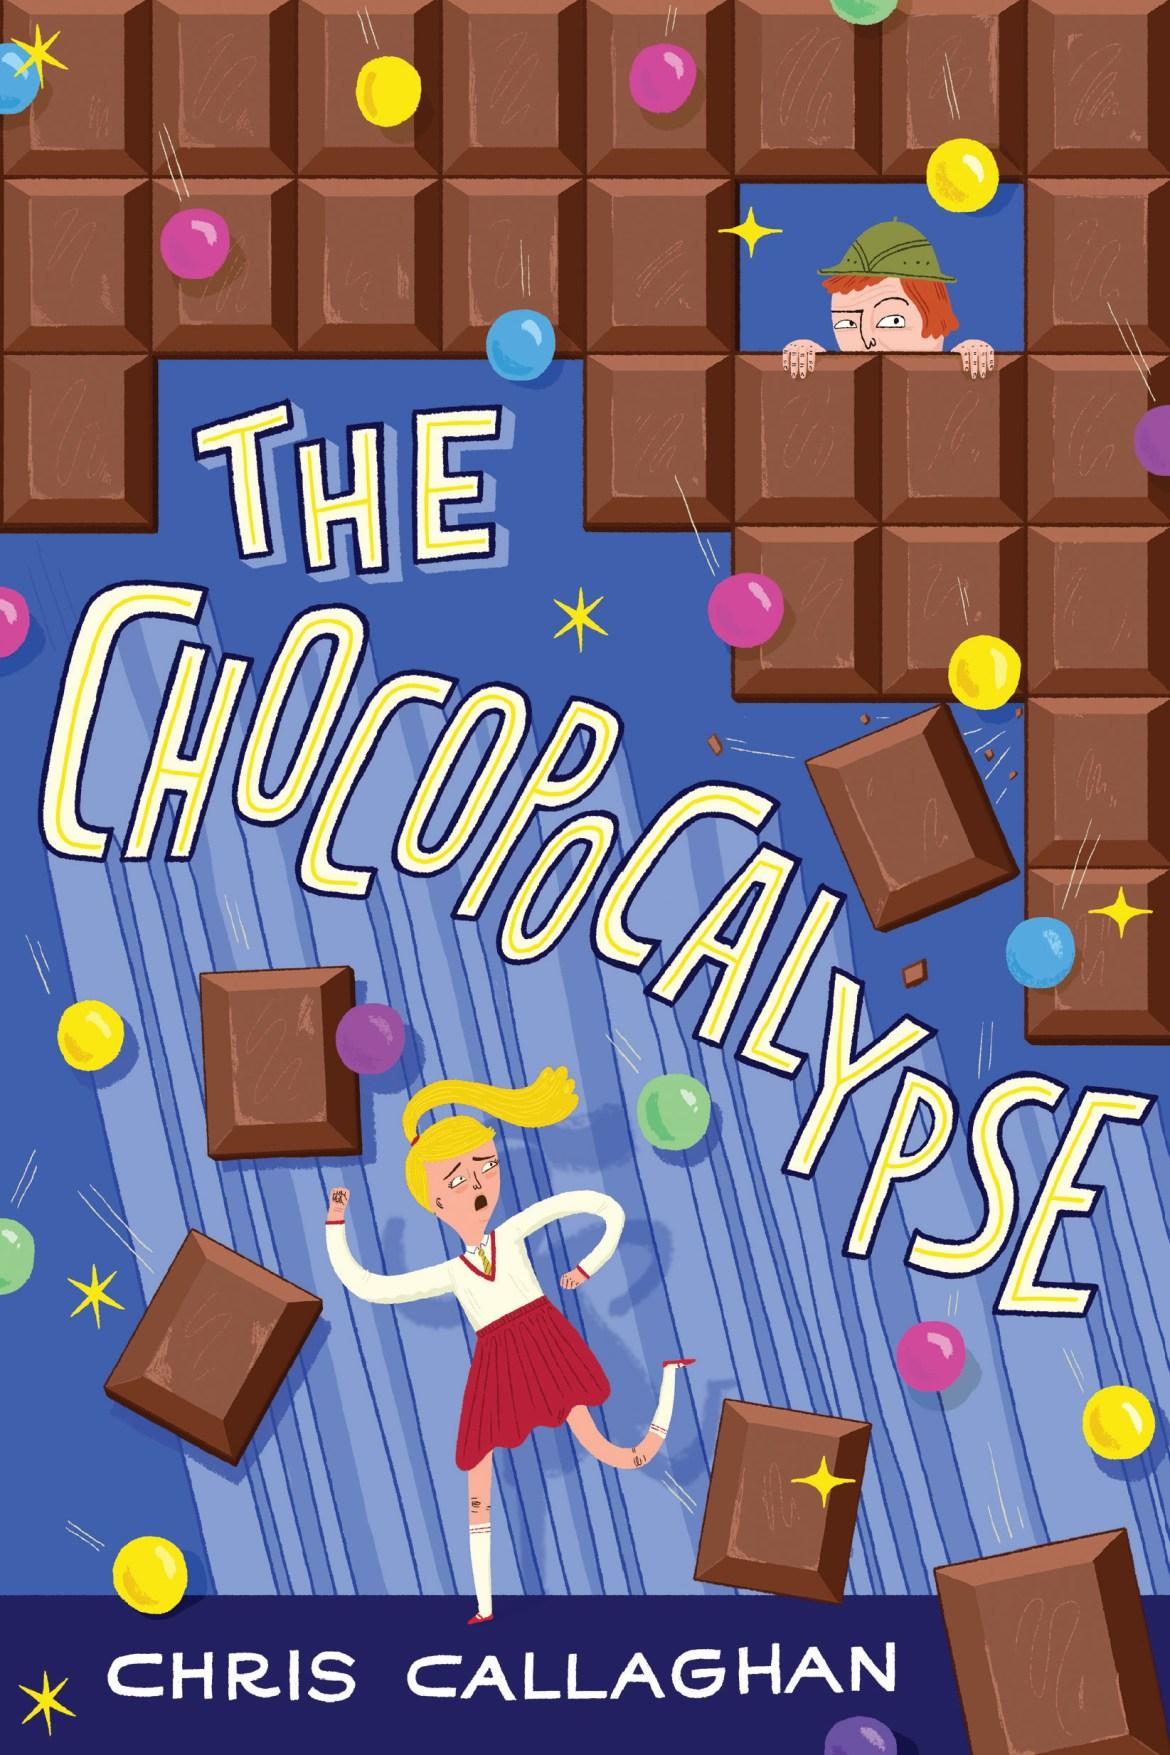 Chocopocalypse, Great Chocoplot, Chris Callaghan, chocolate